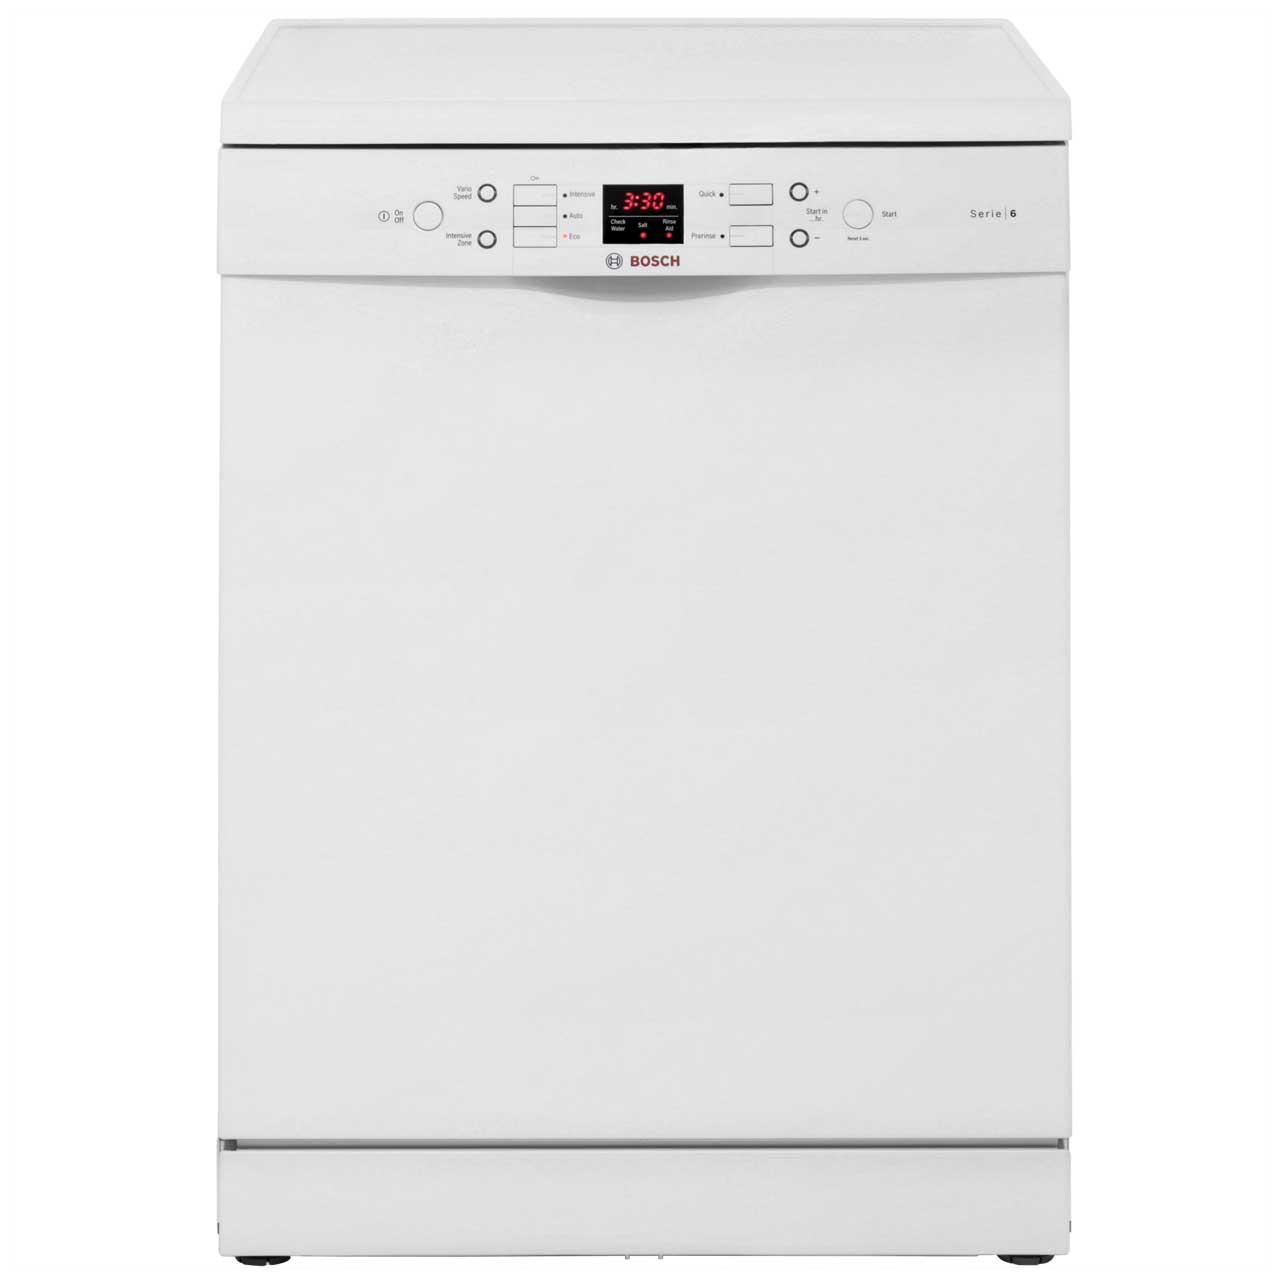 bosch serie 6 sms53m02gb standard dishwasher white. Black Bedroom Furniture Sets. Home Design Ideas